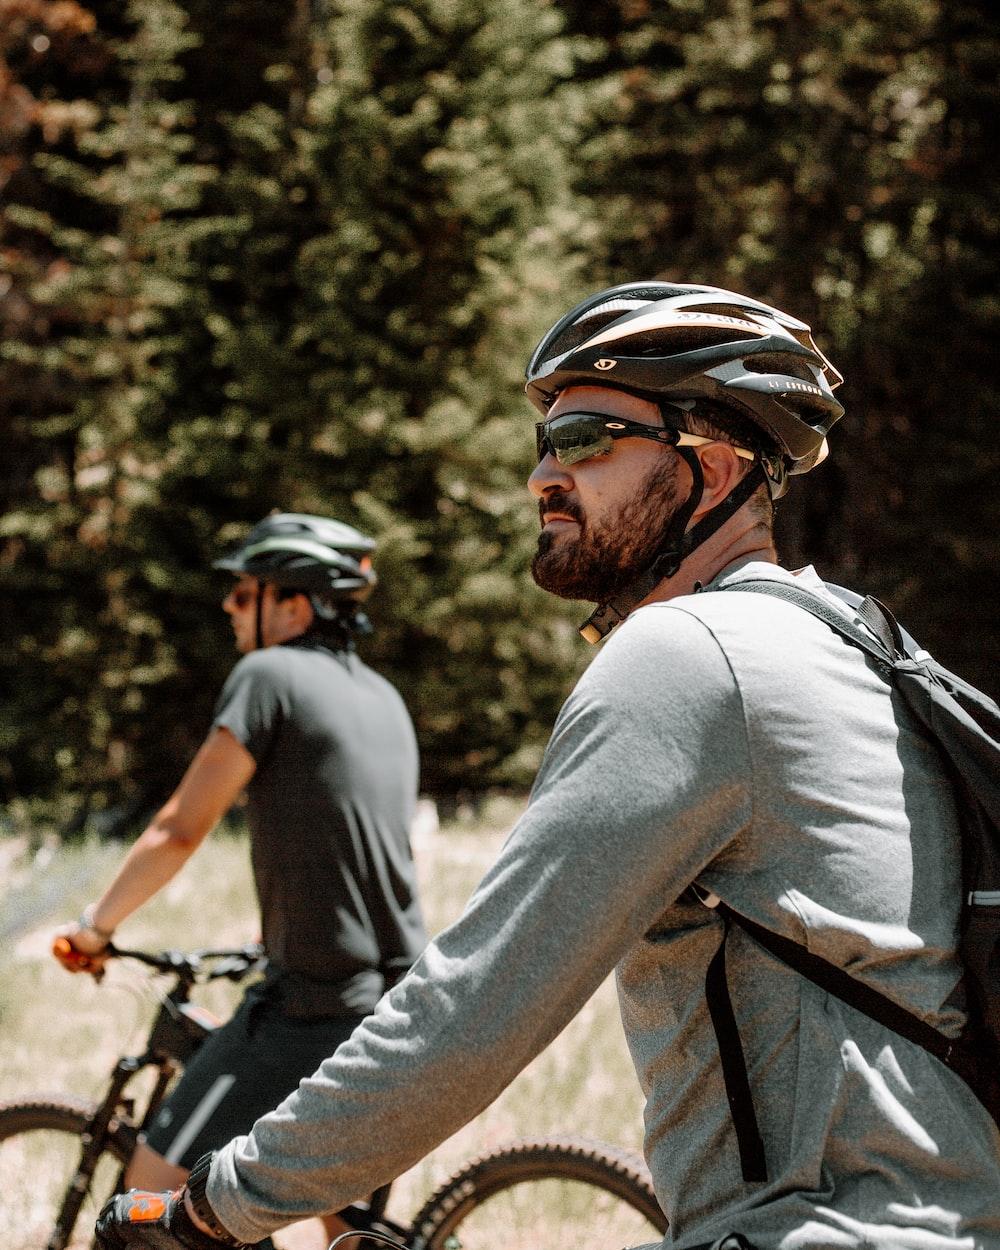 man in gray long sleeve shirt riding bicycle during daytime